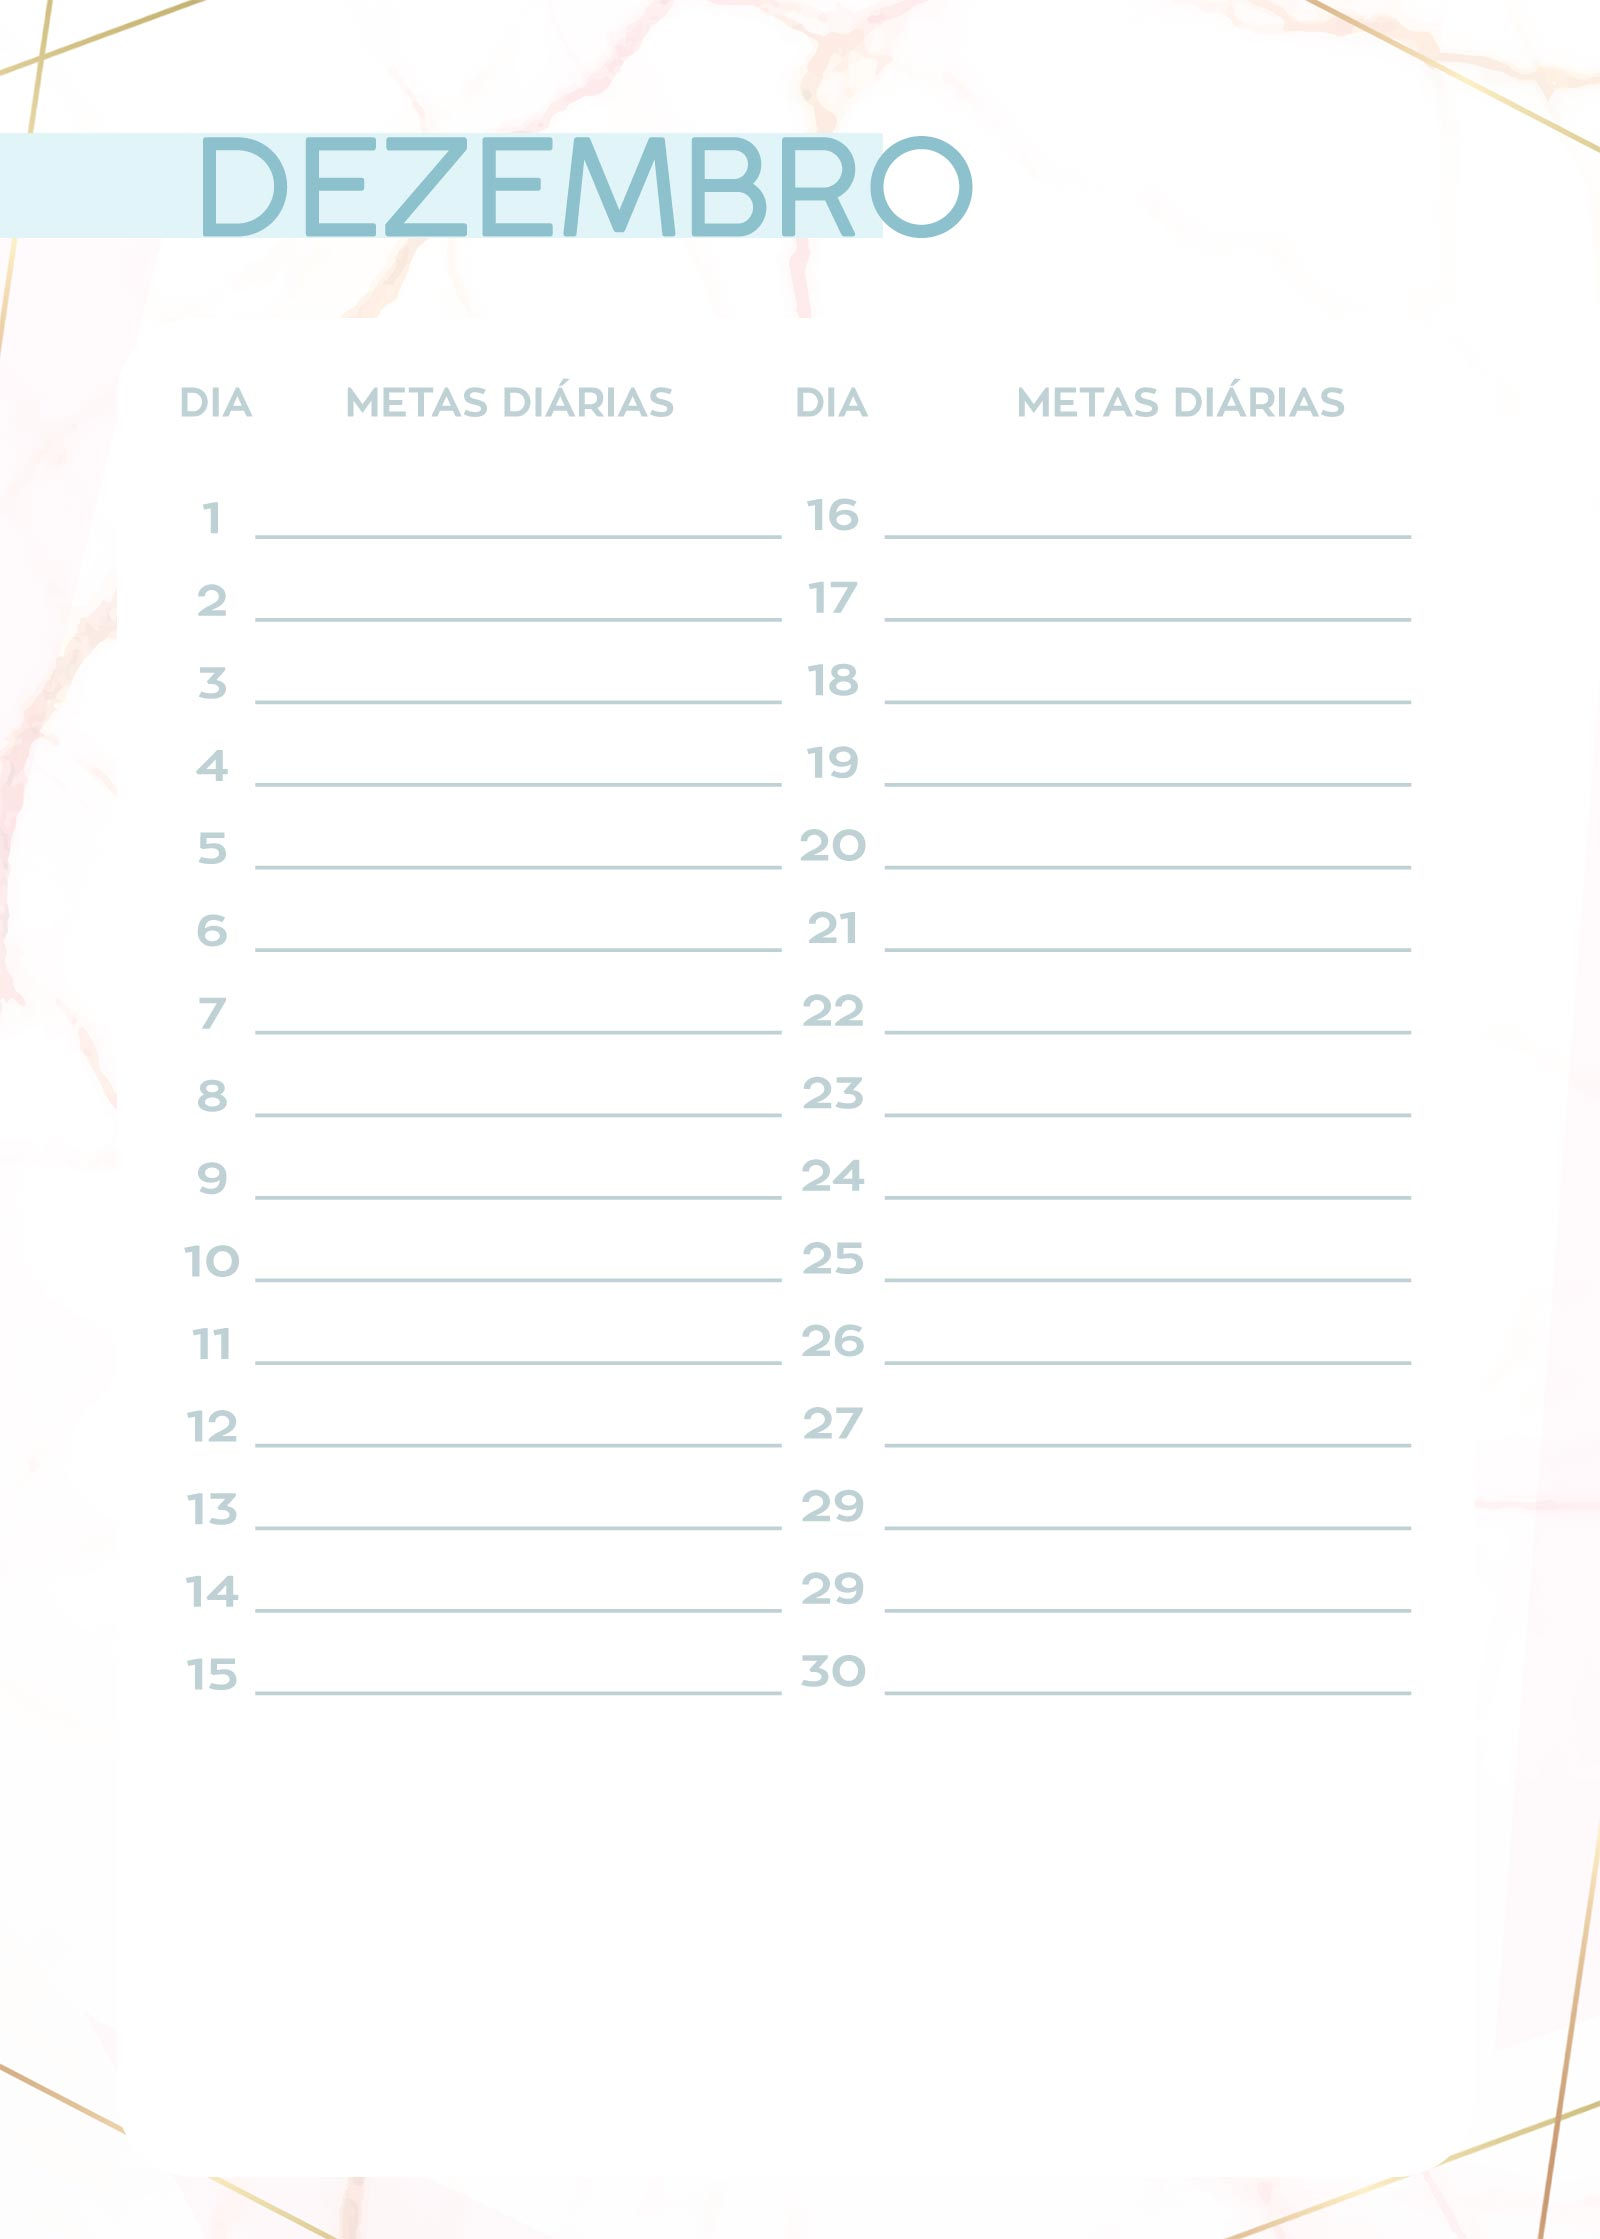 Planner Marmore metas diarias dez